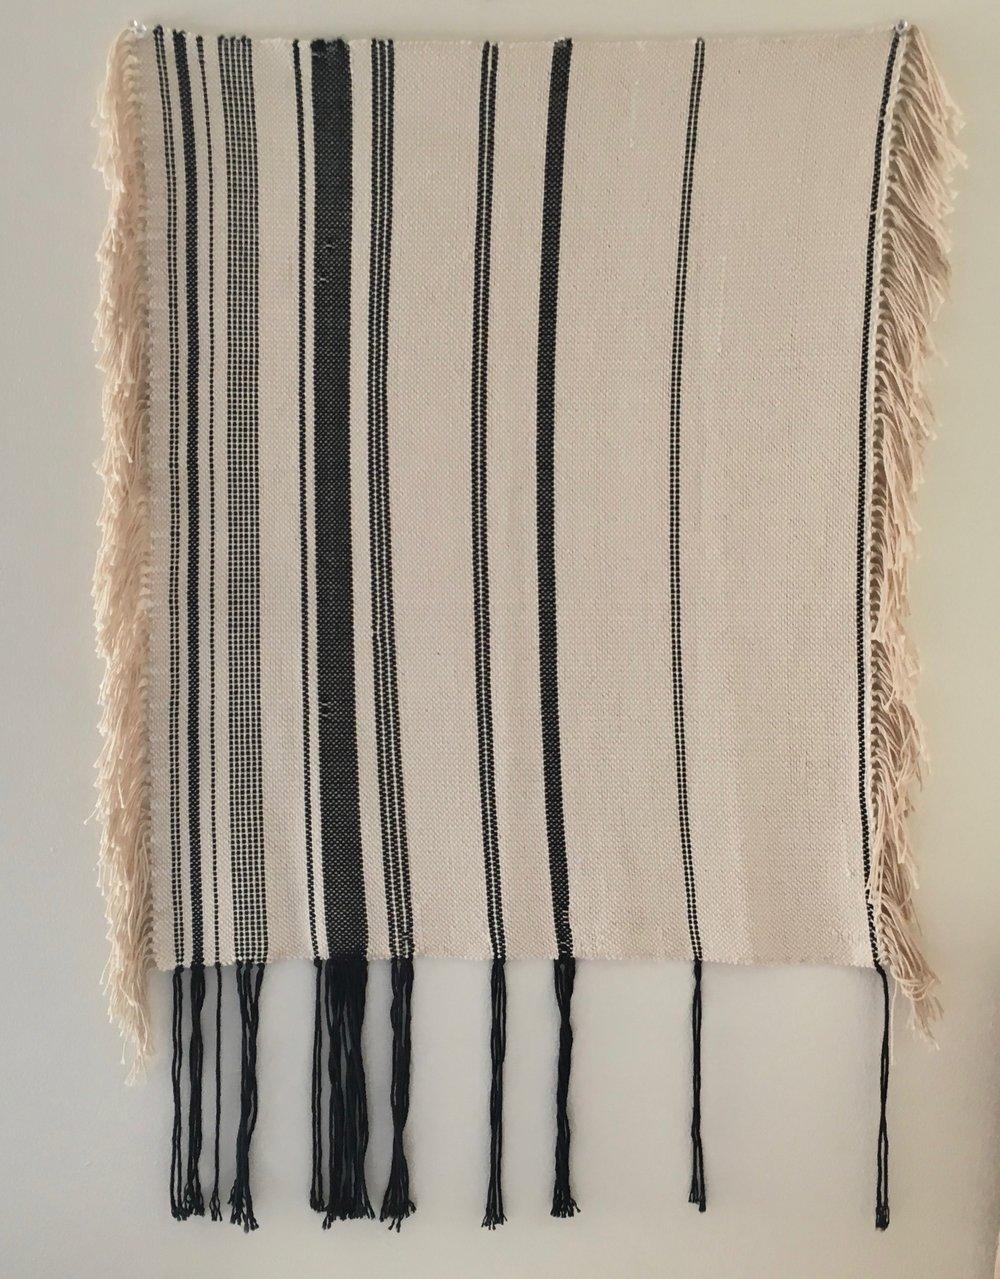 Weft Study #2, hanging weft threads